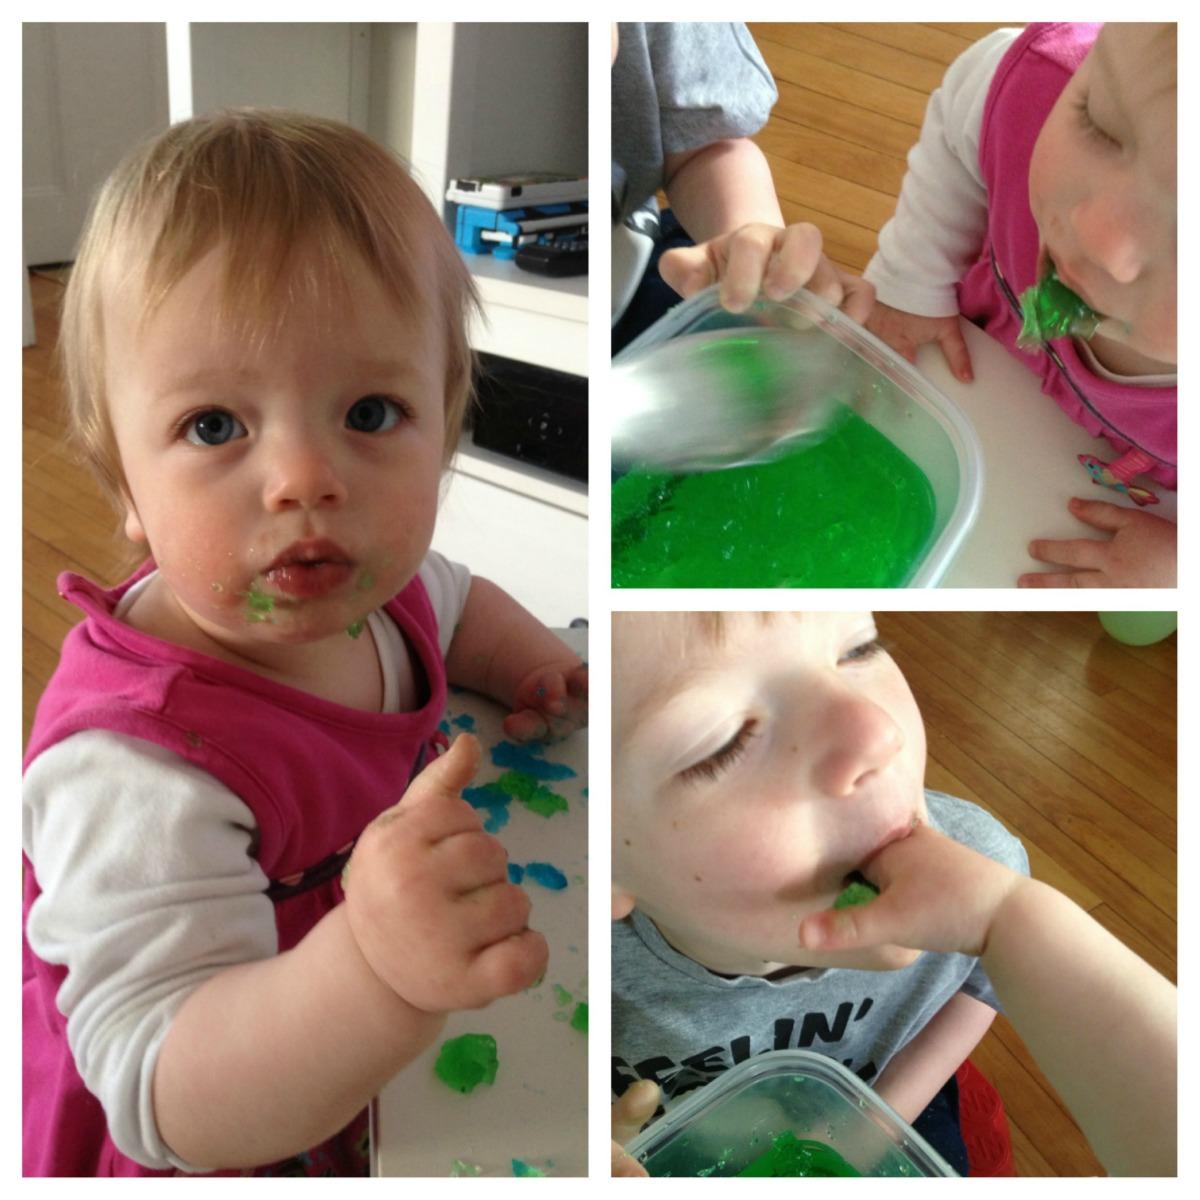 7. Feeding the Jello